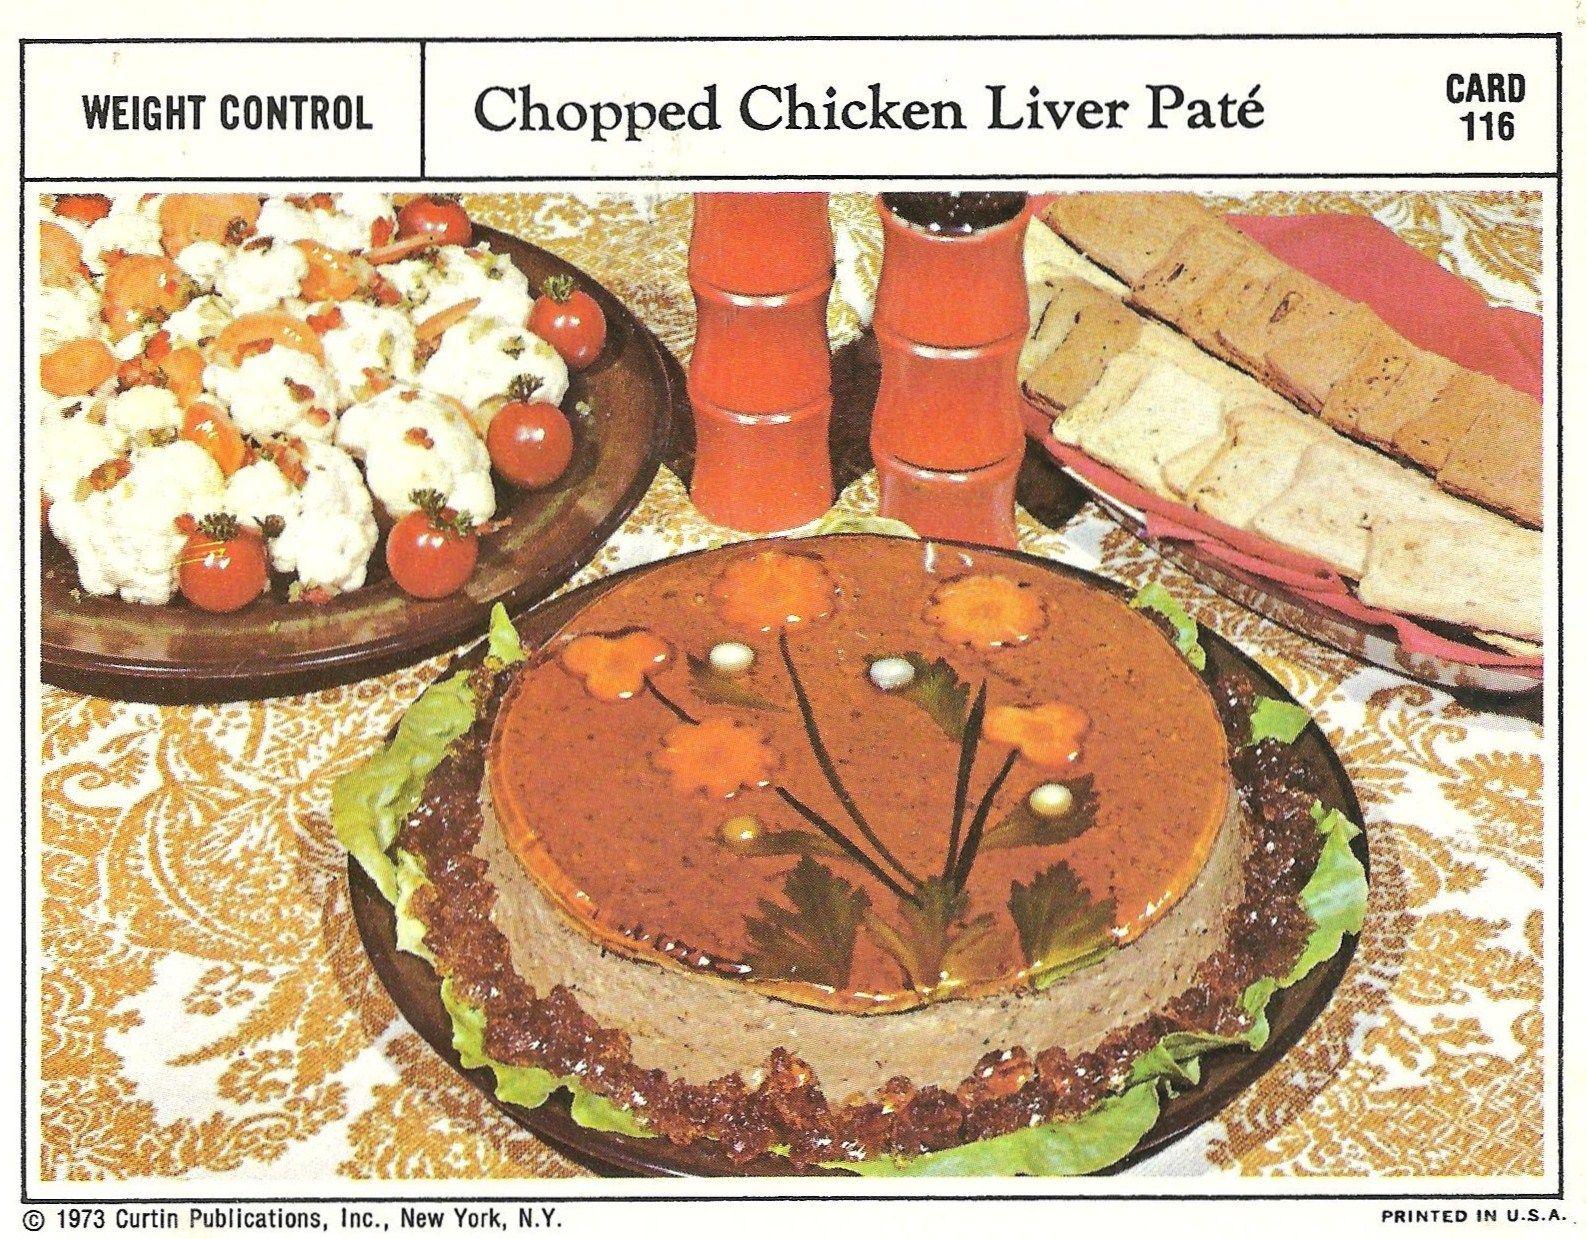 70s recipe cards obscene cuisine pinterest recipe cards retro 70s recipe cards forumfinder Gallery